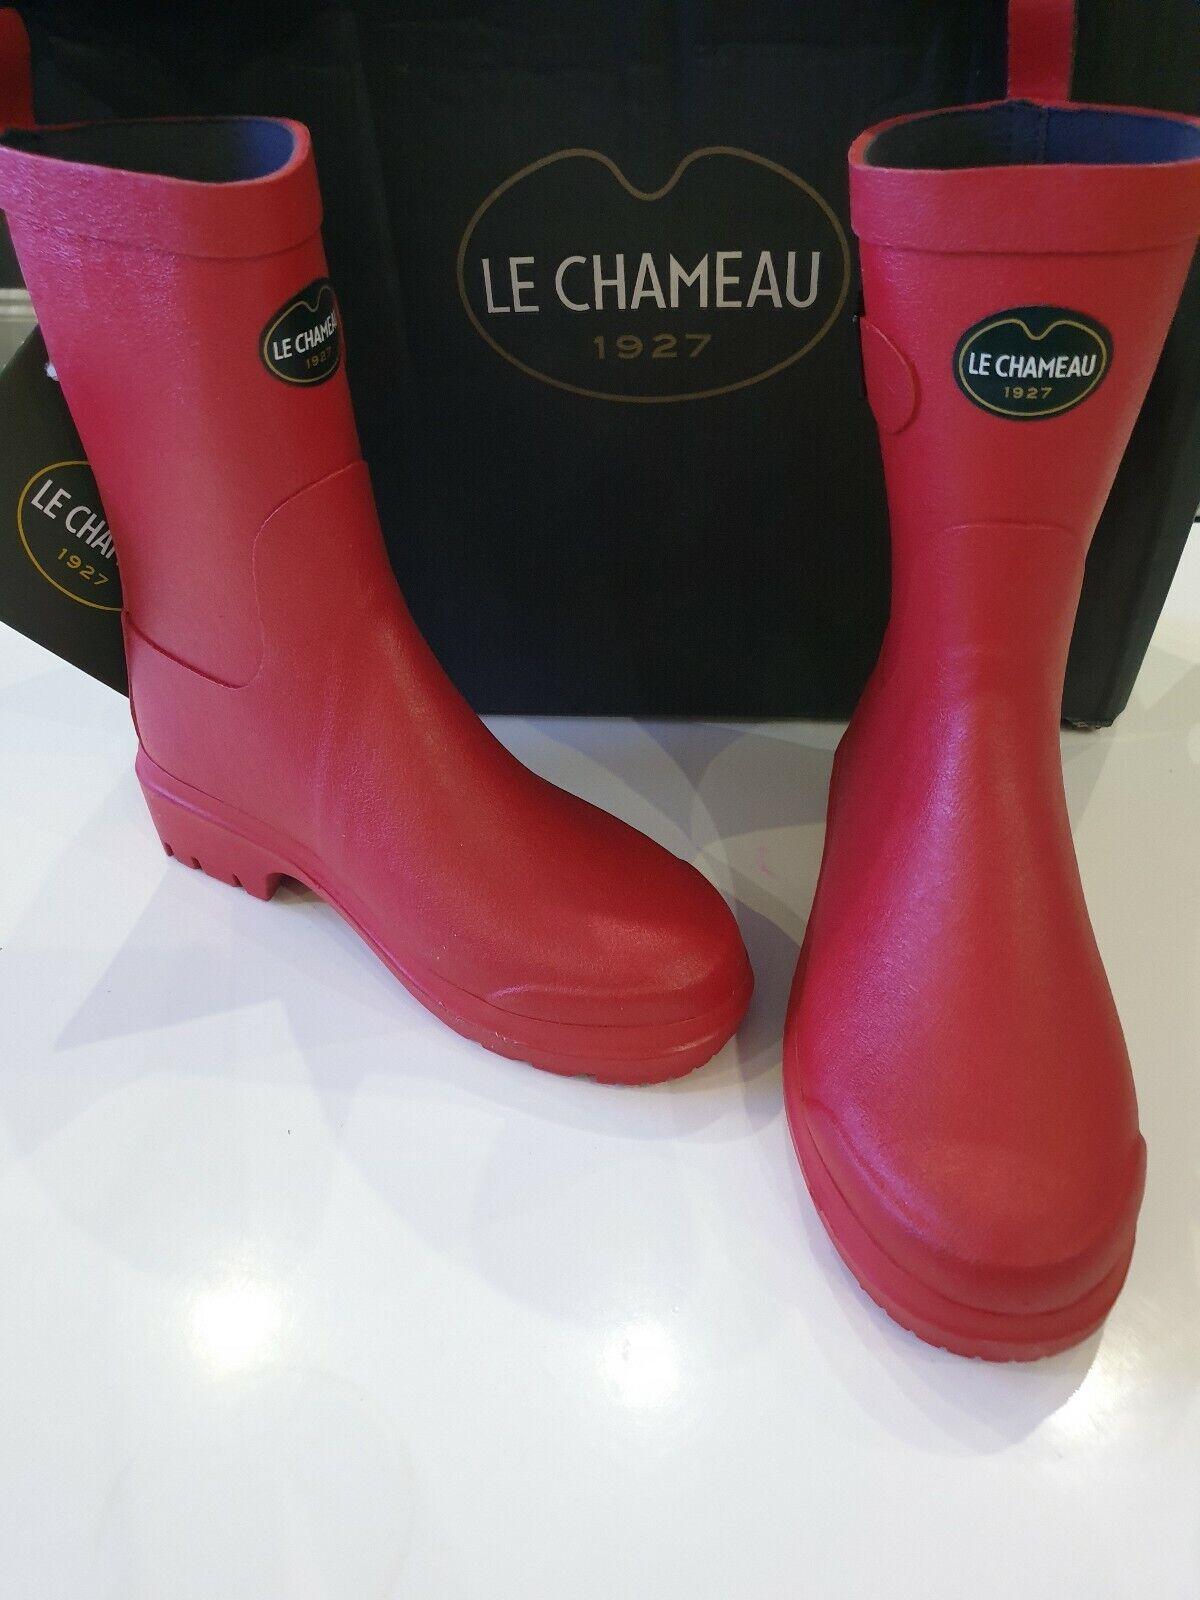 Le Chameau  Low Boot II  size 36 Wellington Boots red Vermillon